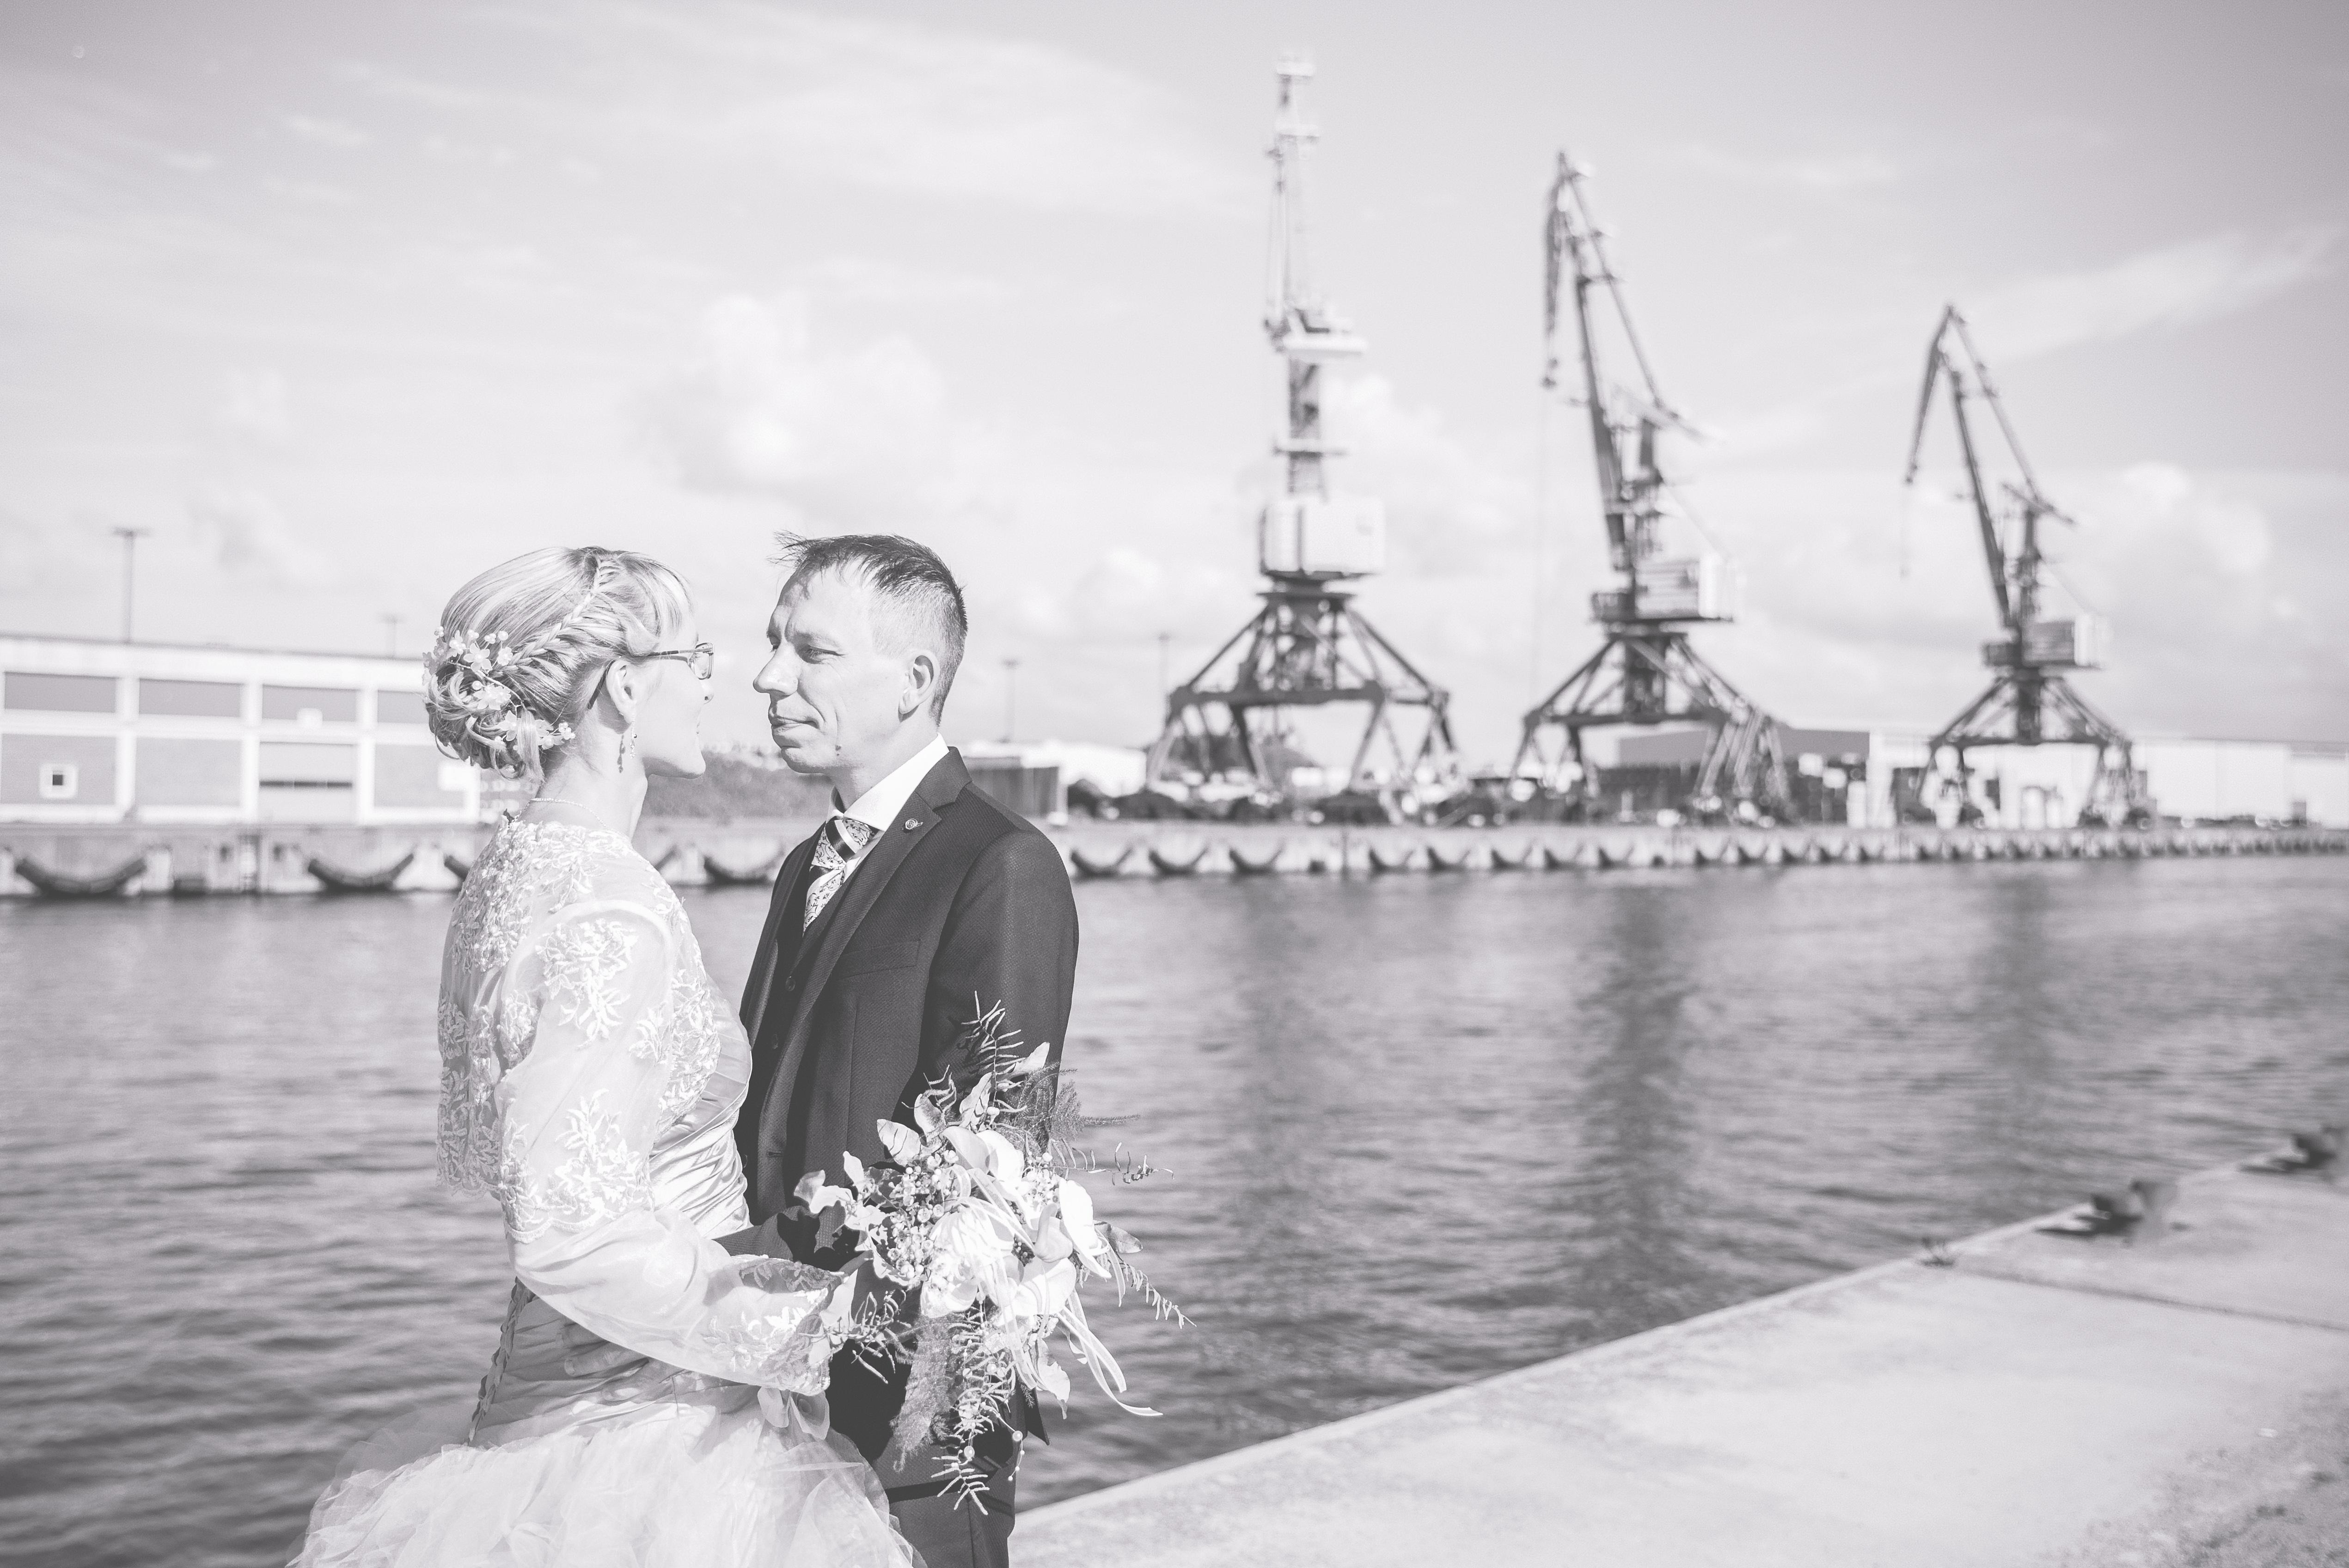 Brautpaarshooting am Hafen in Wismar